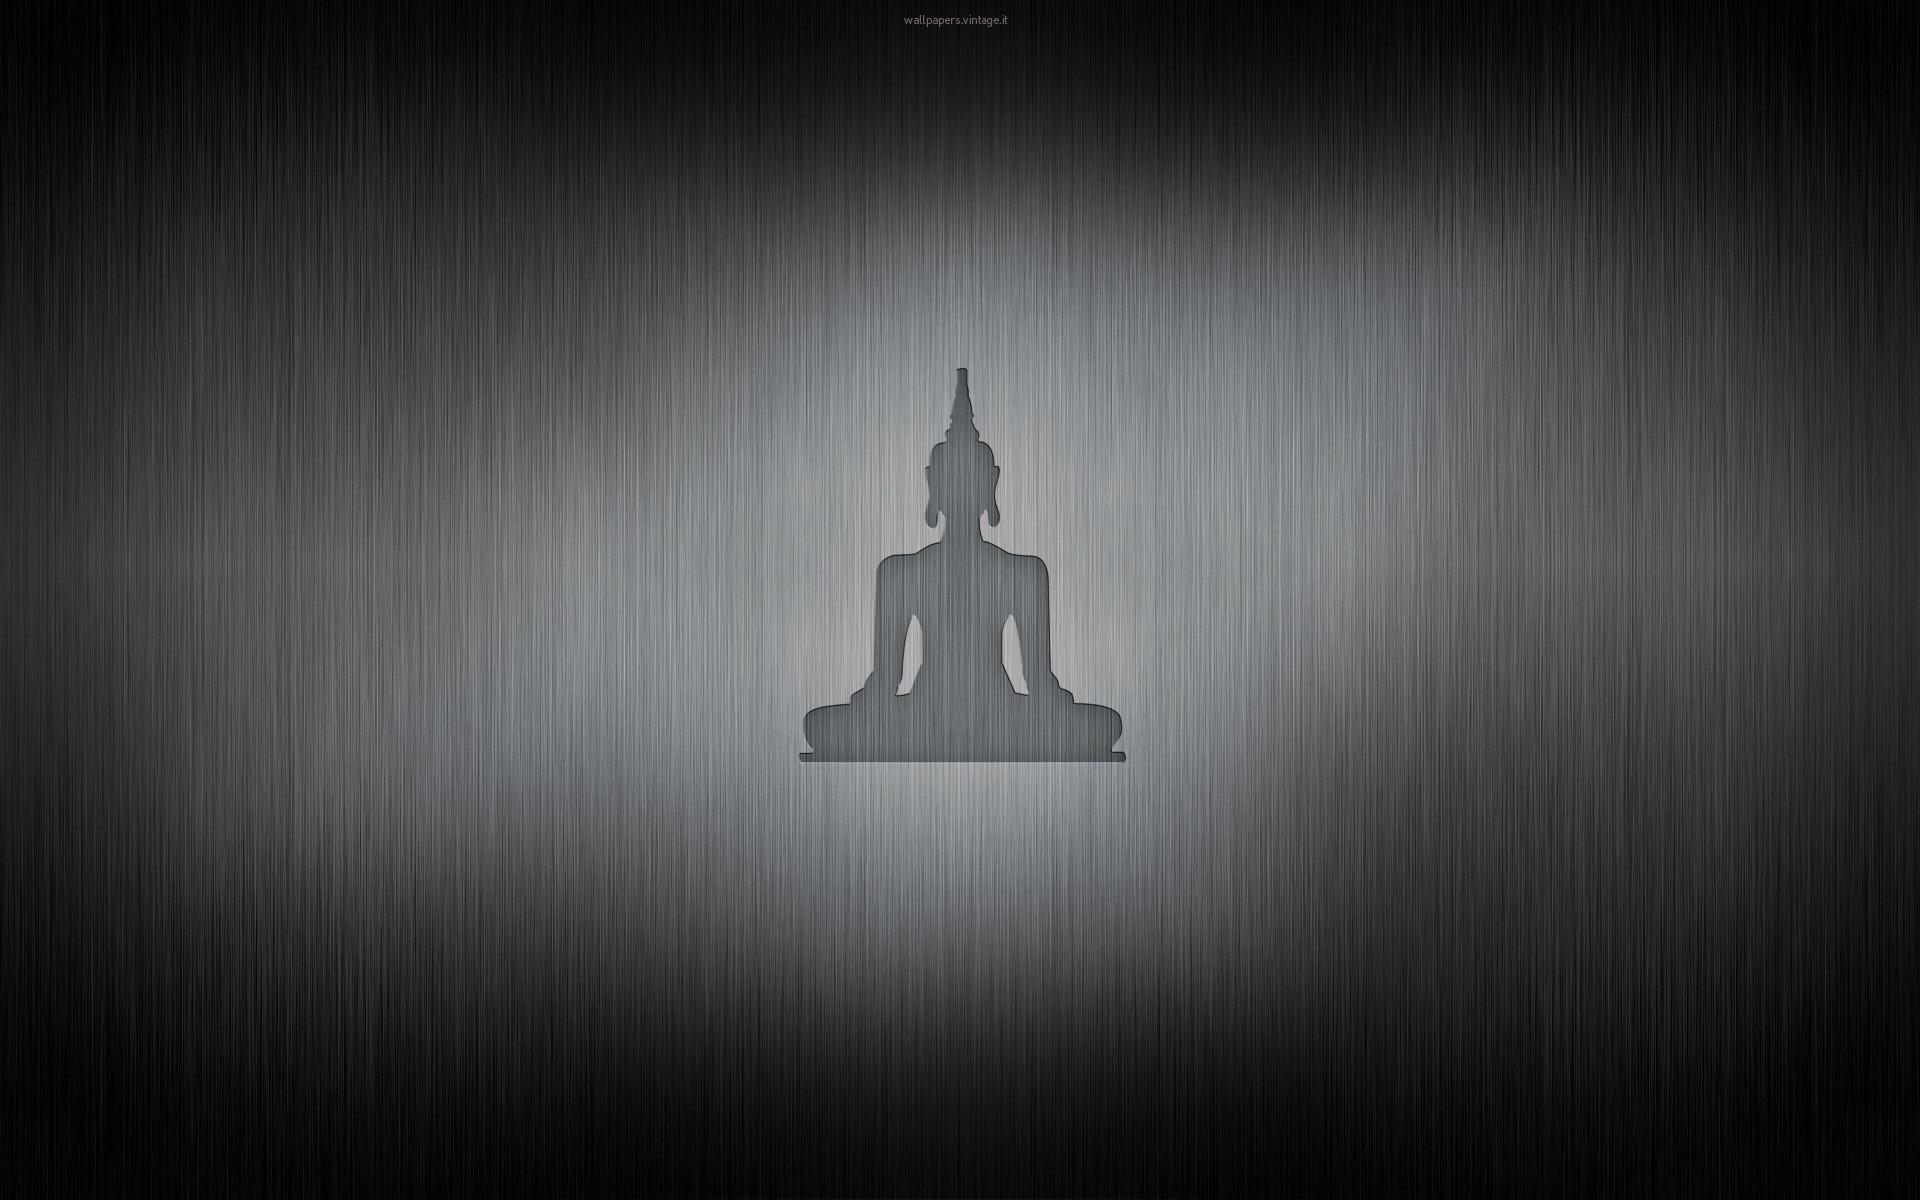 Buddha 1600×1200 Wallpaper Religions Buddha Hd Art Hd Wallpaper